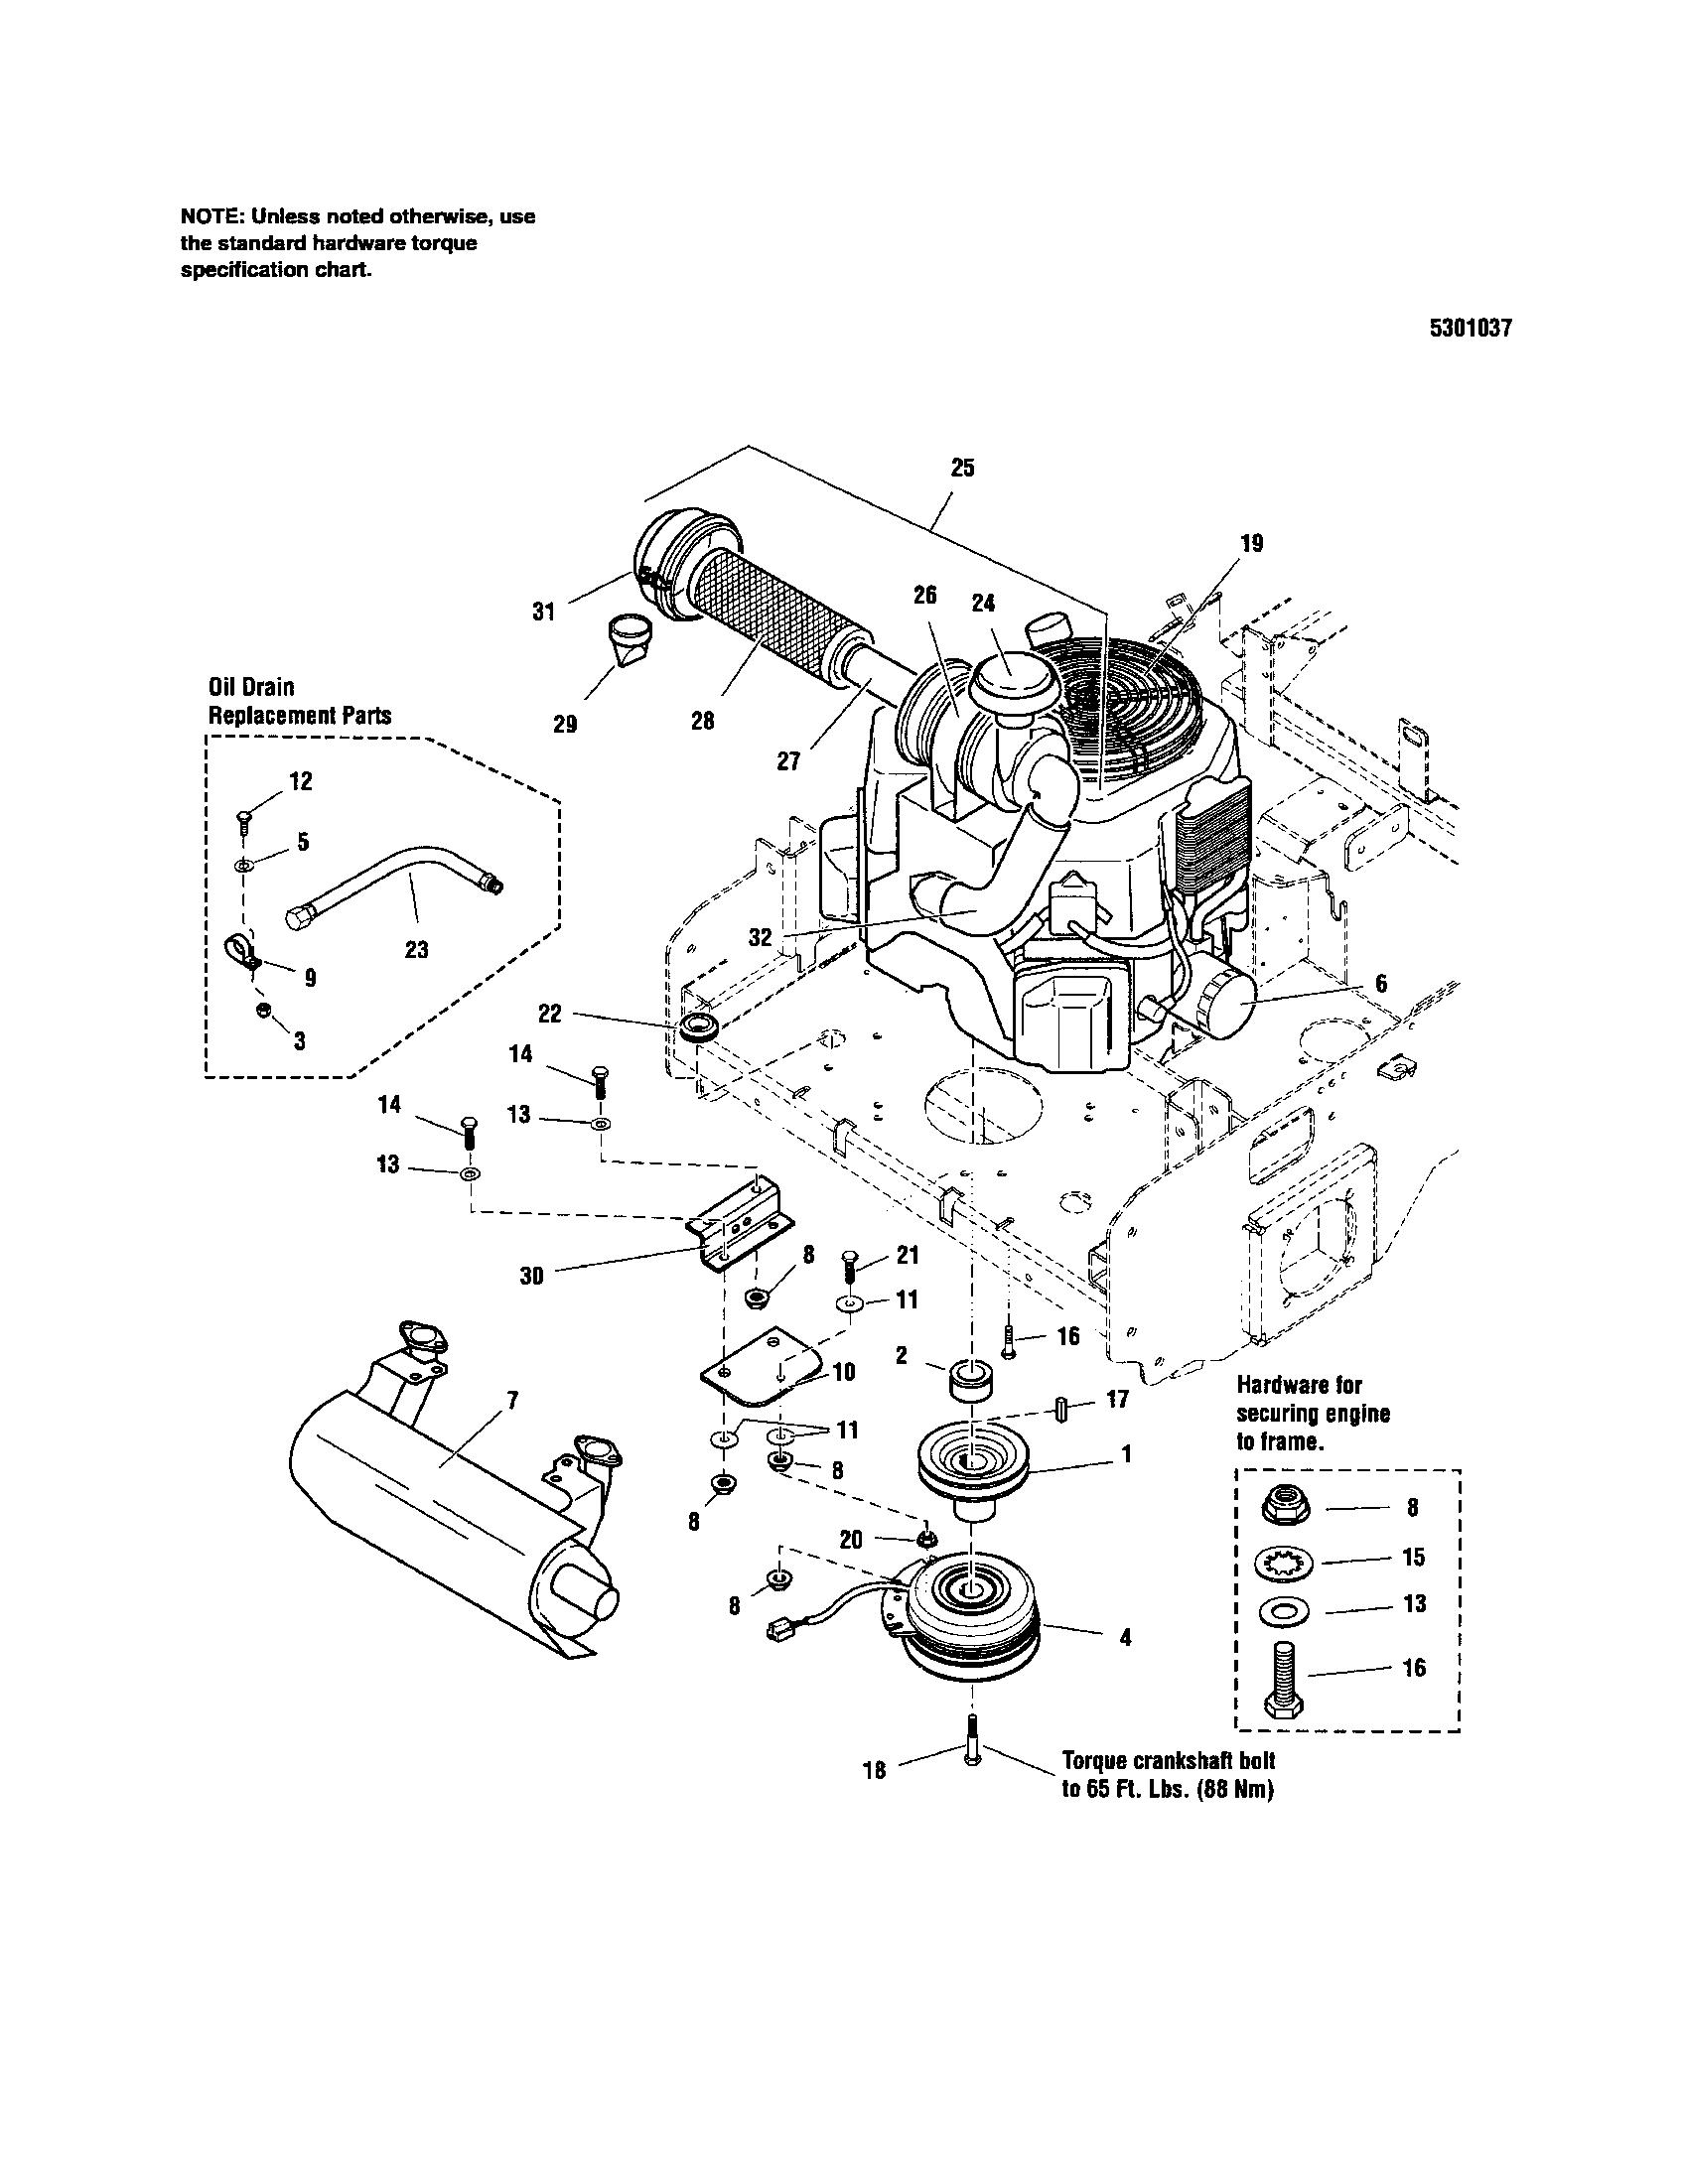 medium resolution of snapper 5900693 engine pto 27 hp kohler diagram